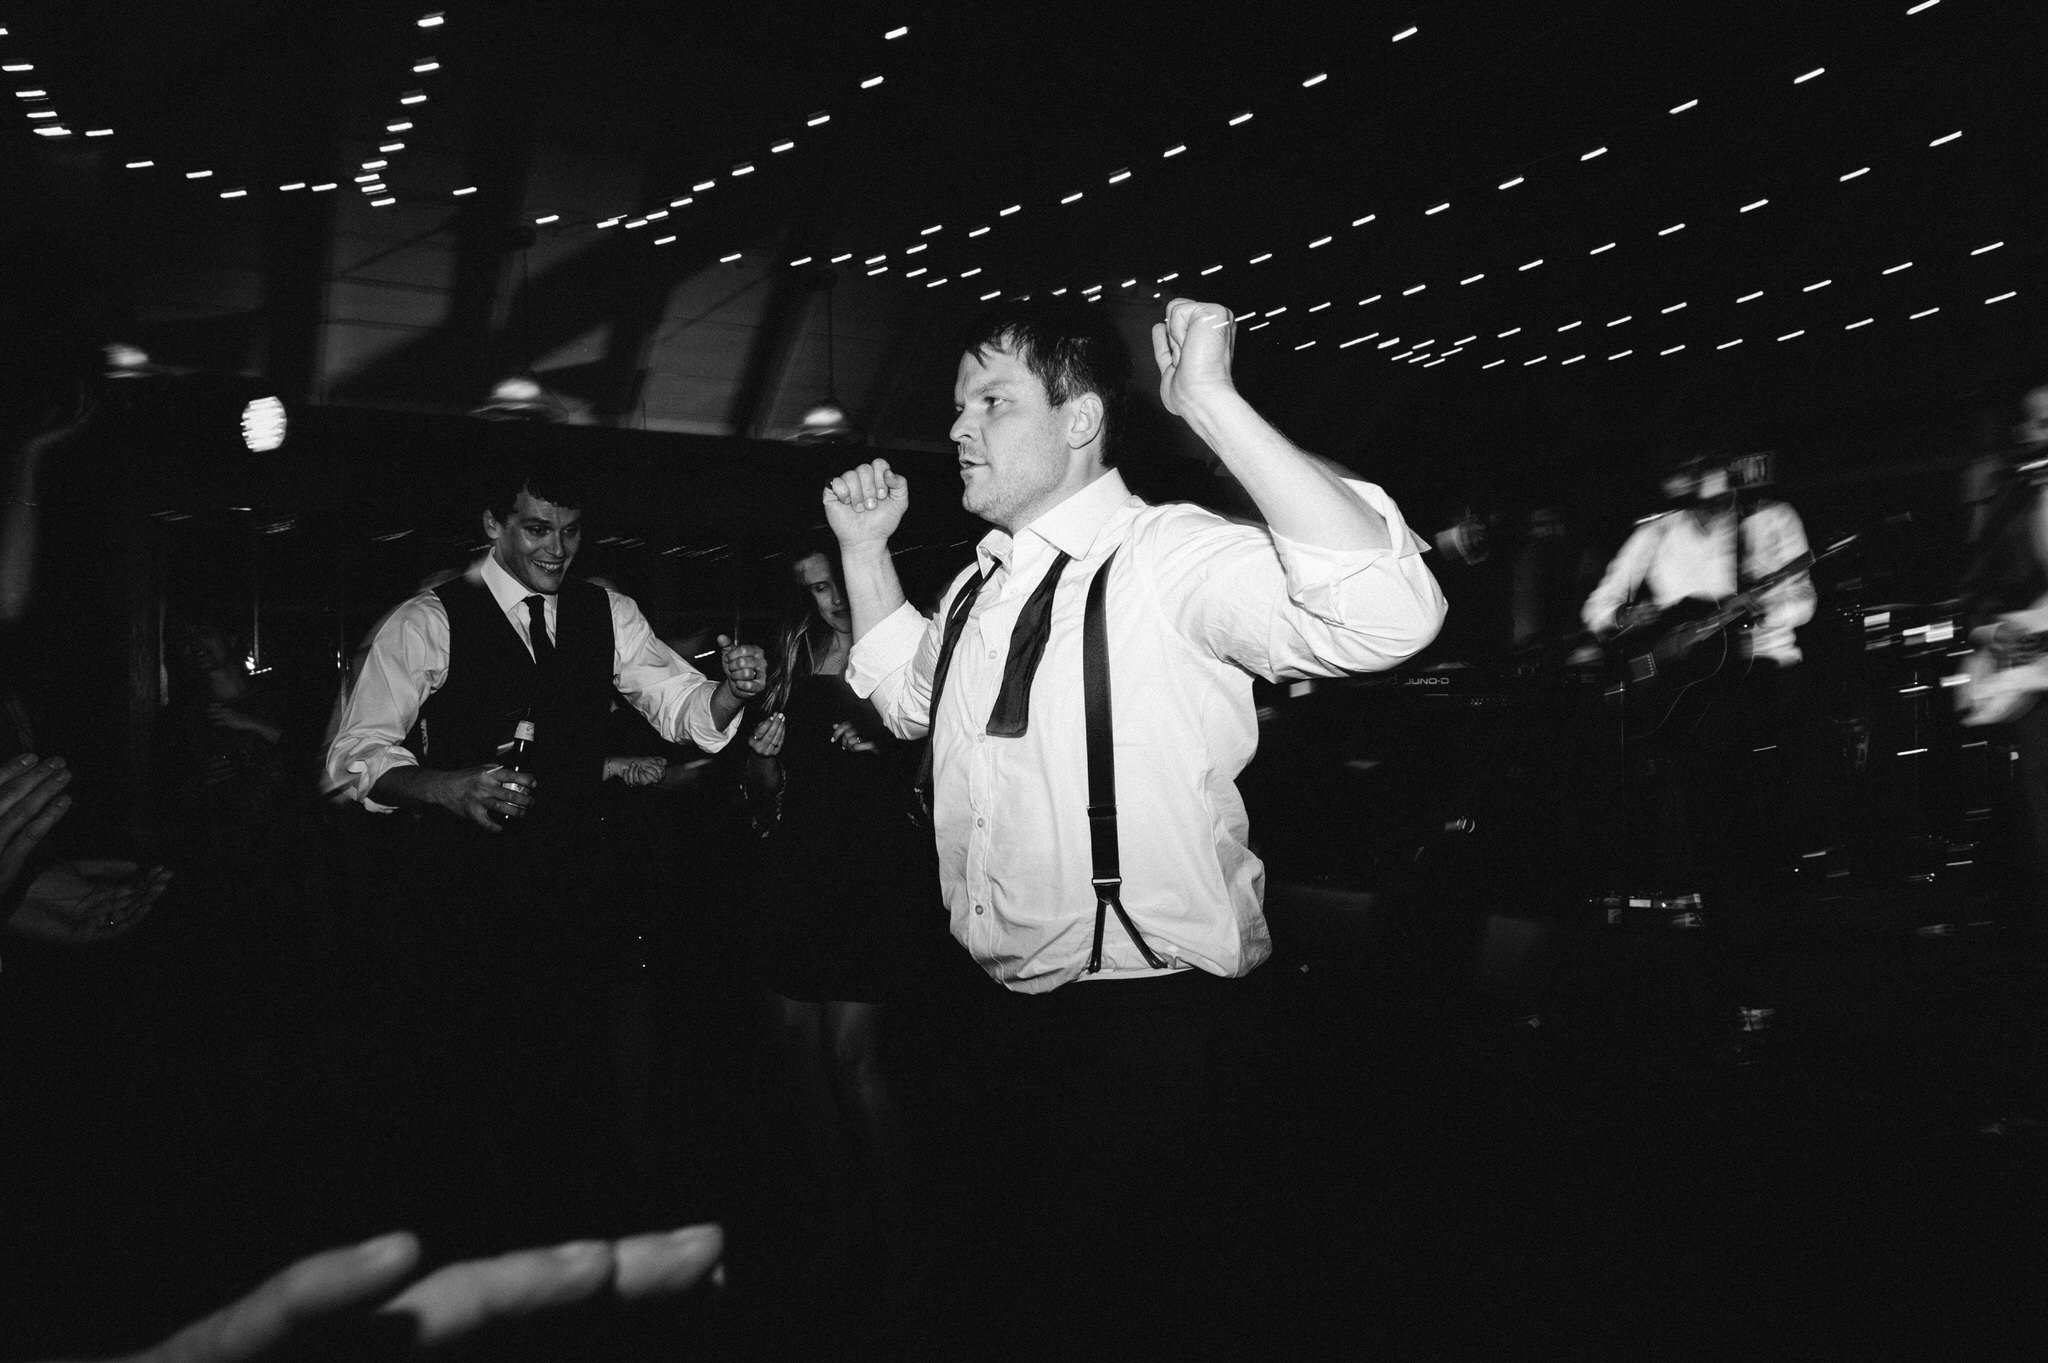 scarletoneillphotography_weddingphotography_prince edward county weddings202.JPG